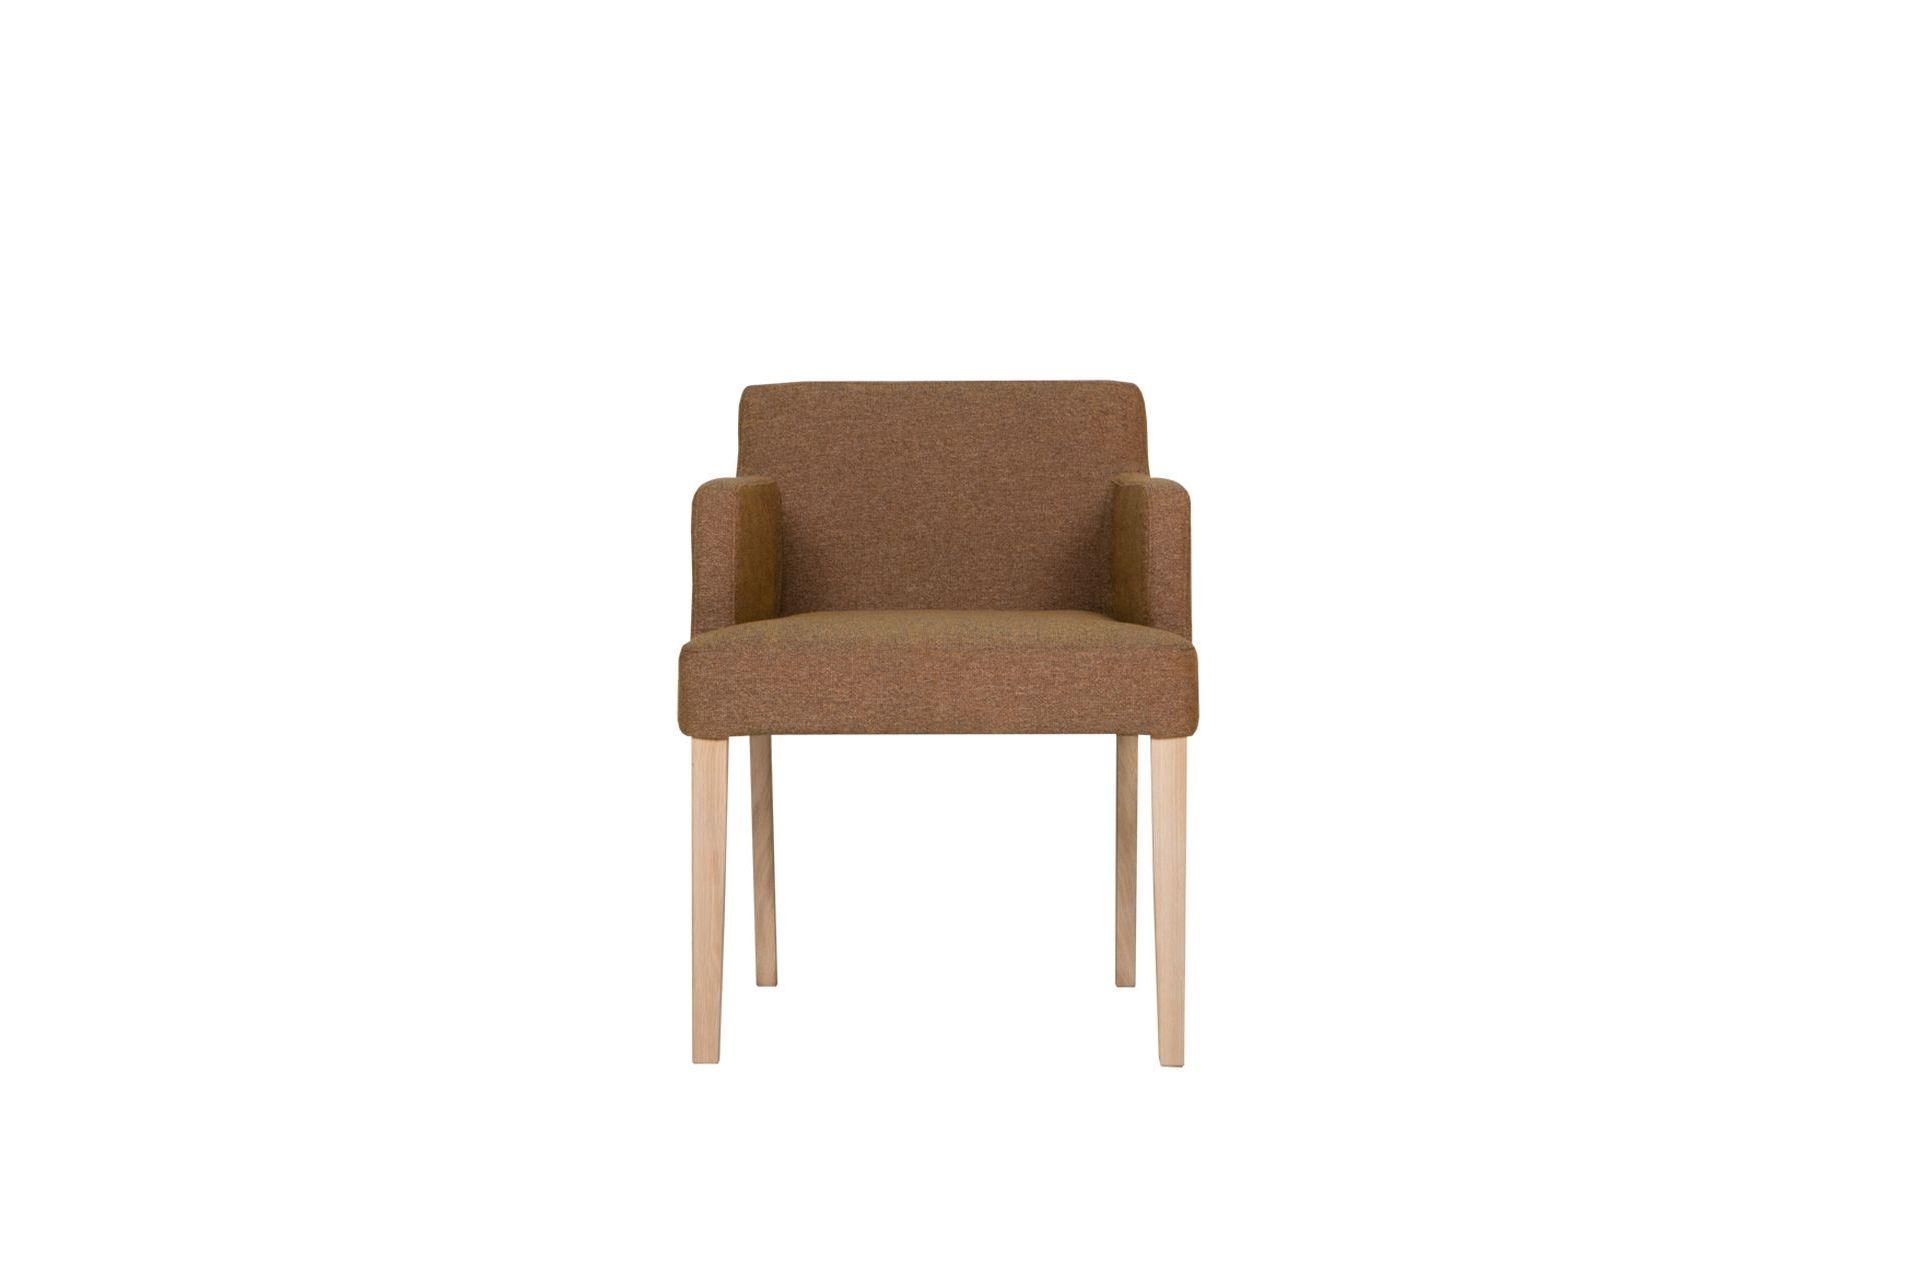 Кресло linn (sits) коричневый 57x74x57 см.